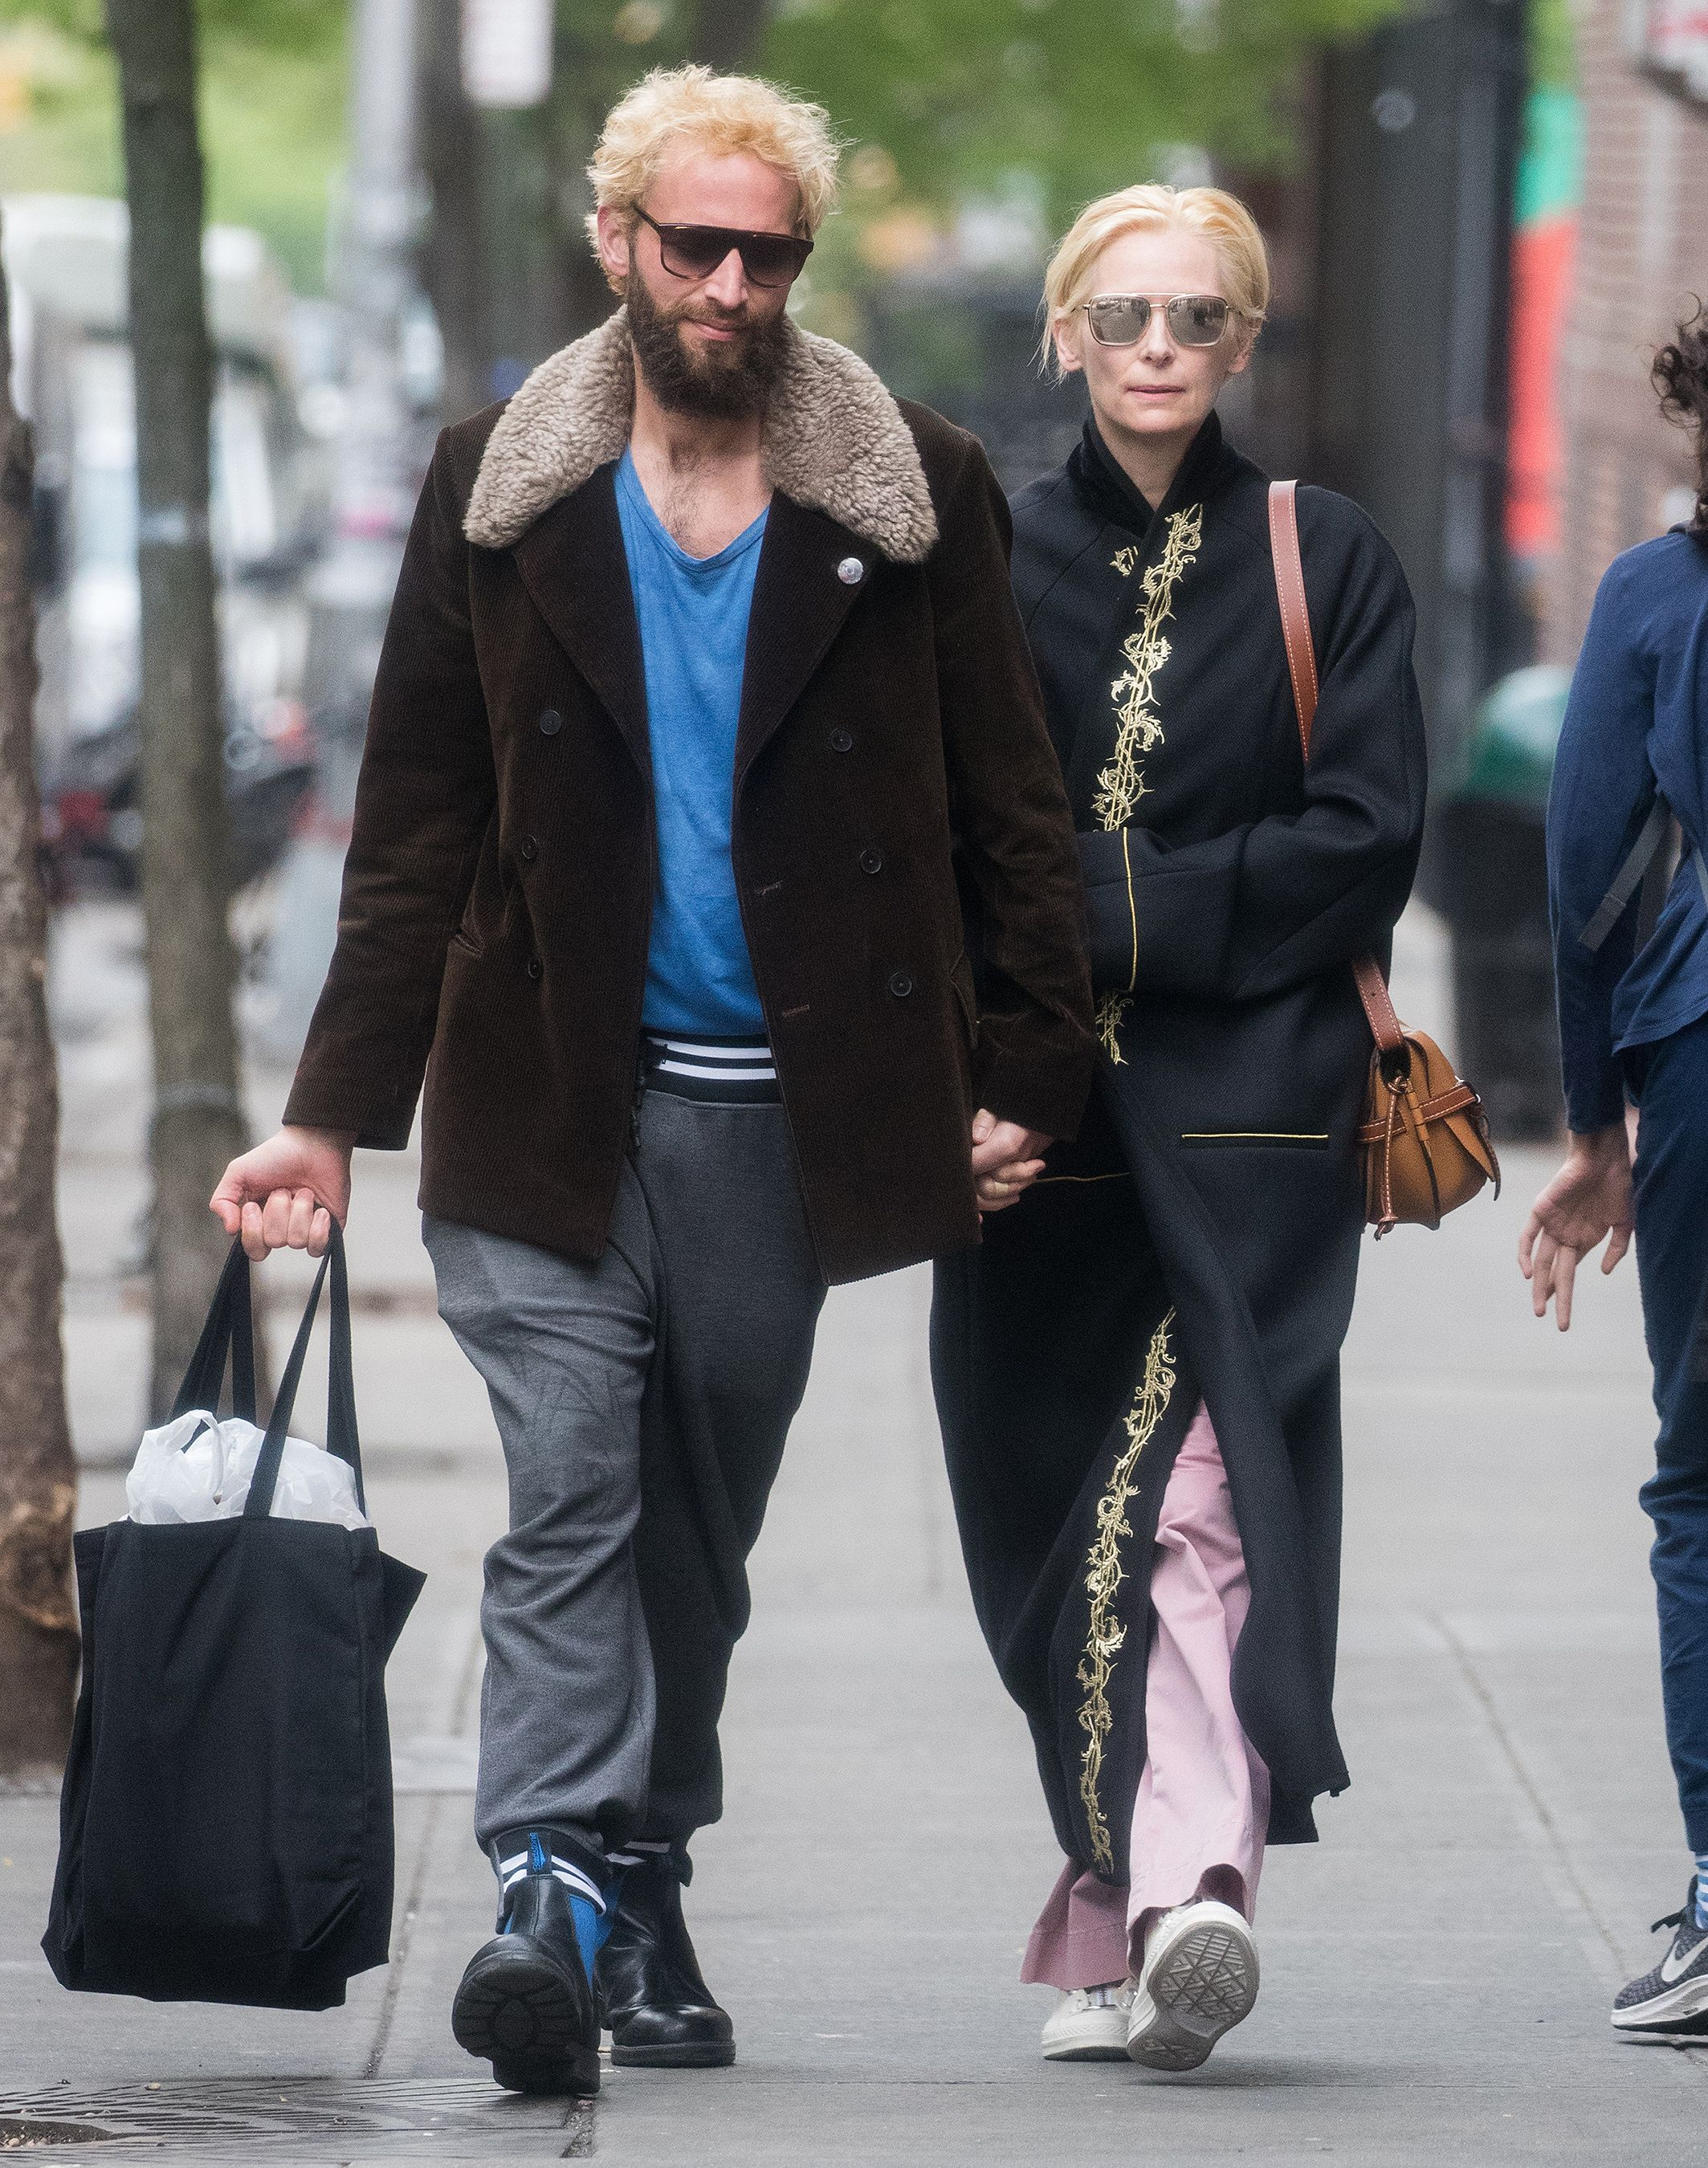 Tilda Swinton Steps Out With Partner Sandro Kopp In Rare Sighting Of Couple In New York City Tilda Swinton Sandro Brown Jacket